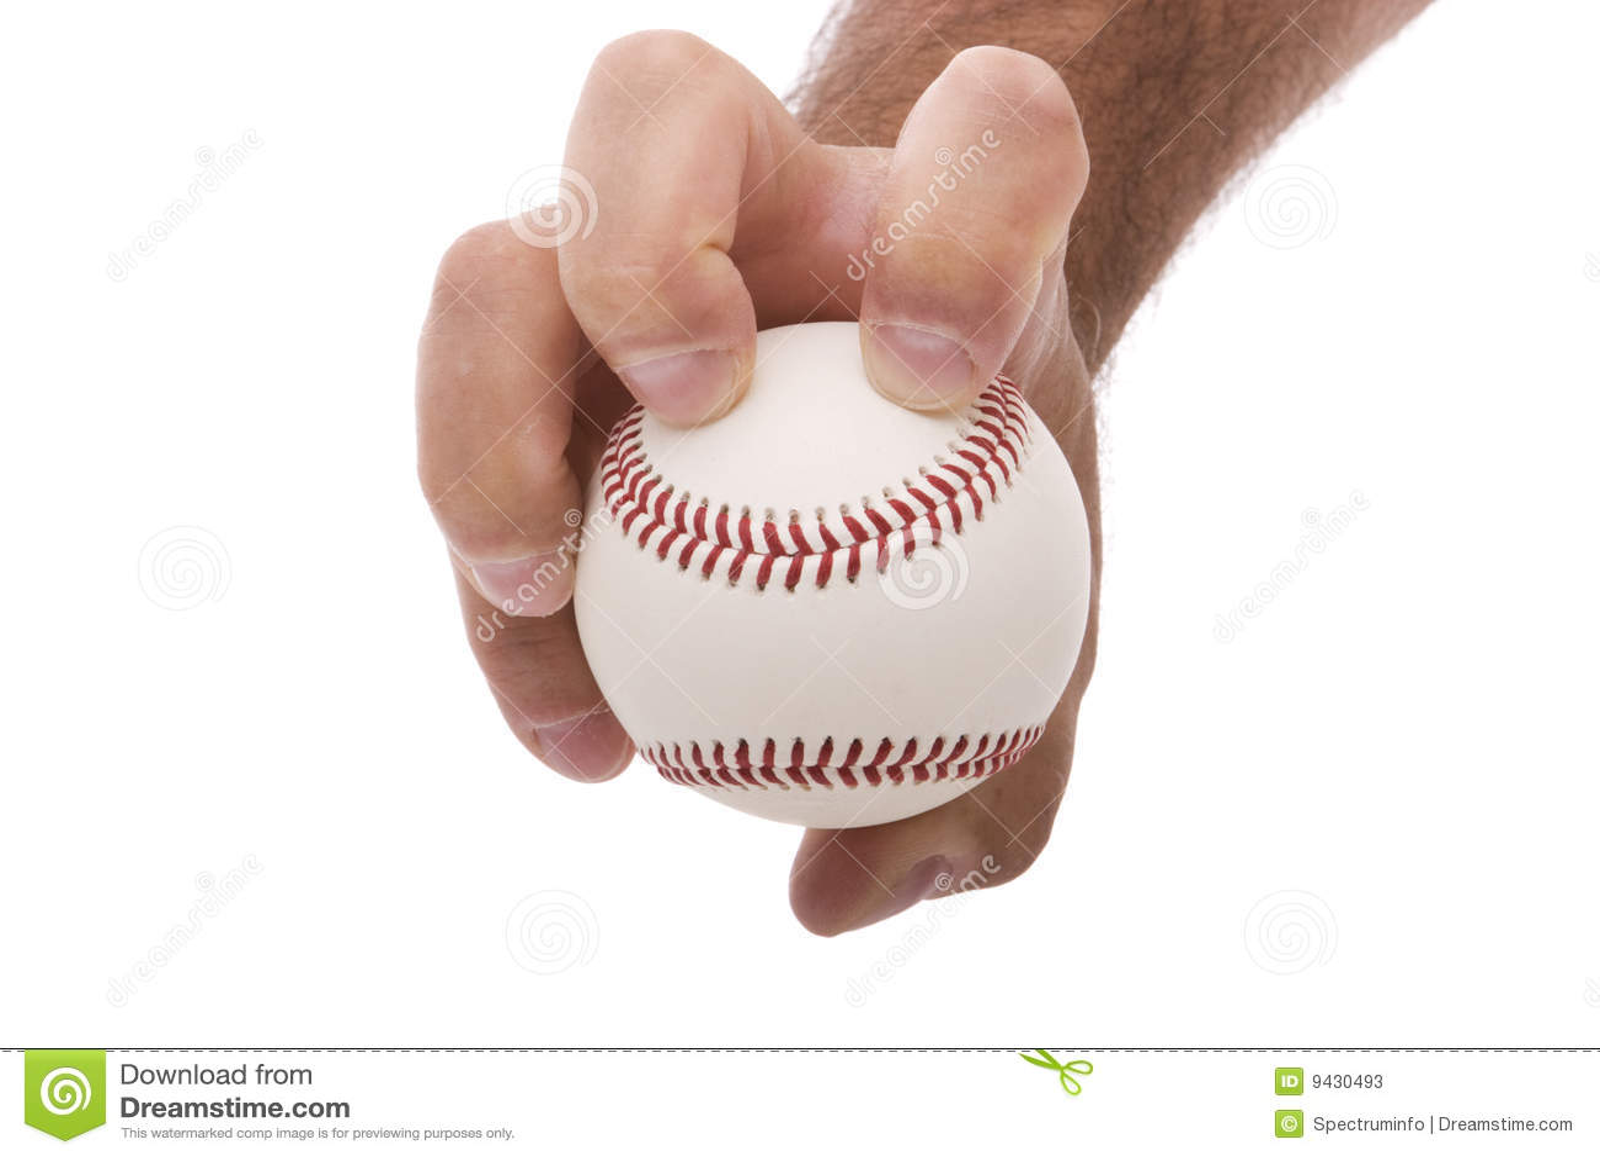 Knuckleball Baseball Pitching Grip Stock Photos - Image: 9430493